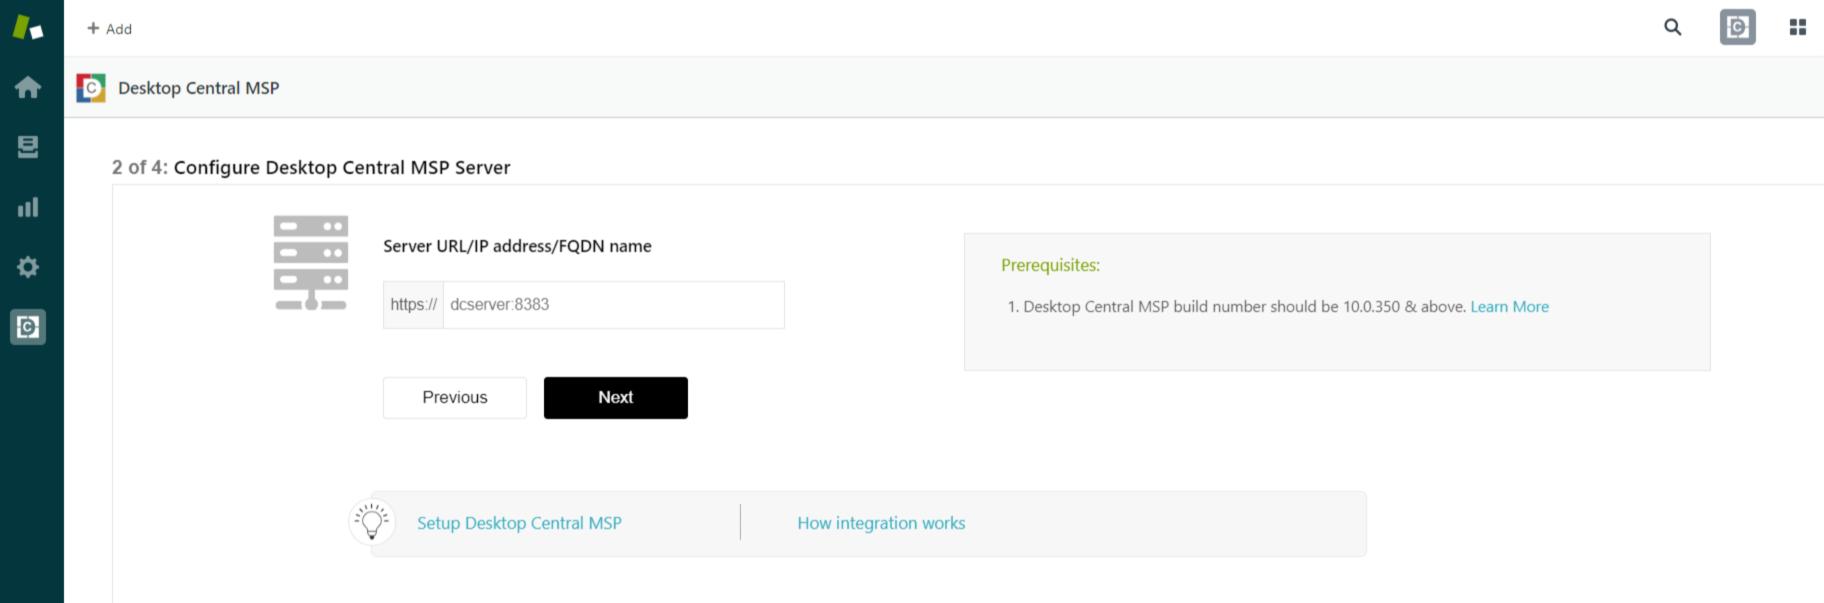 Configure Desktop Central MSP Server